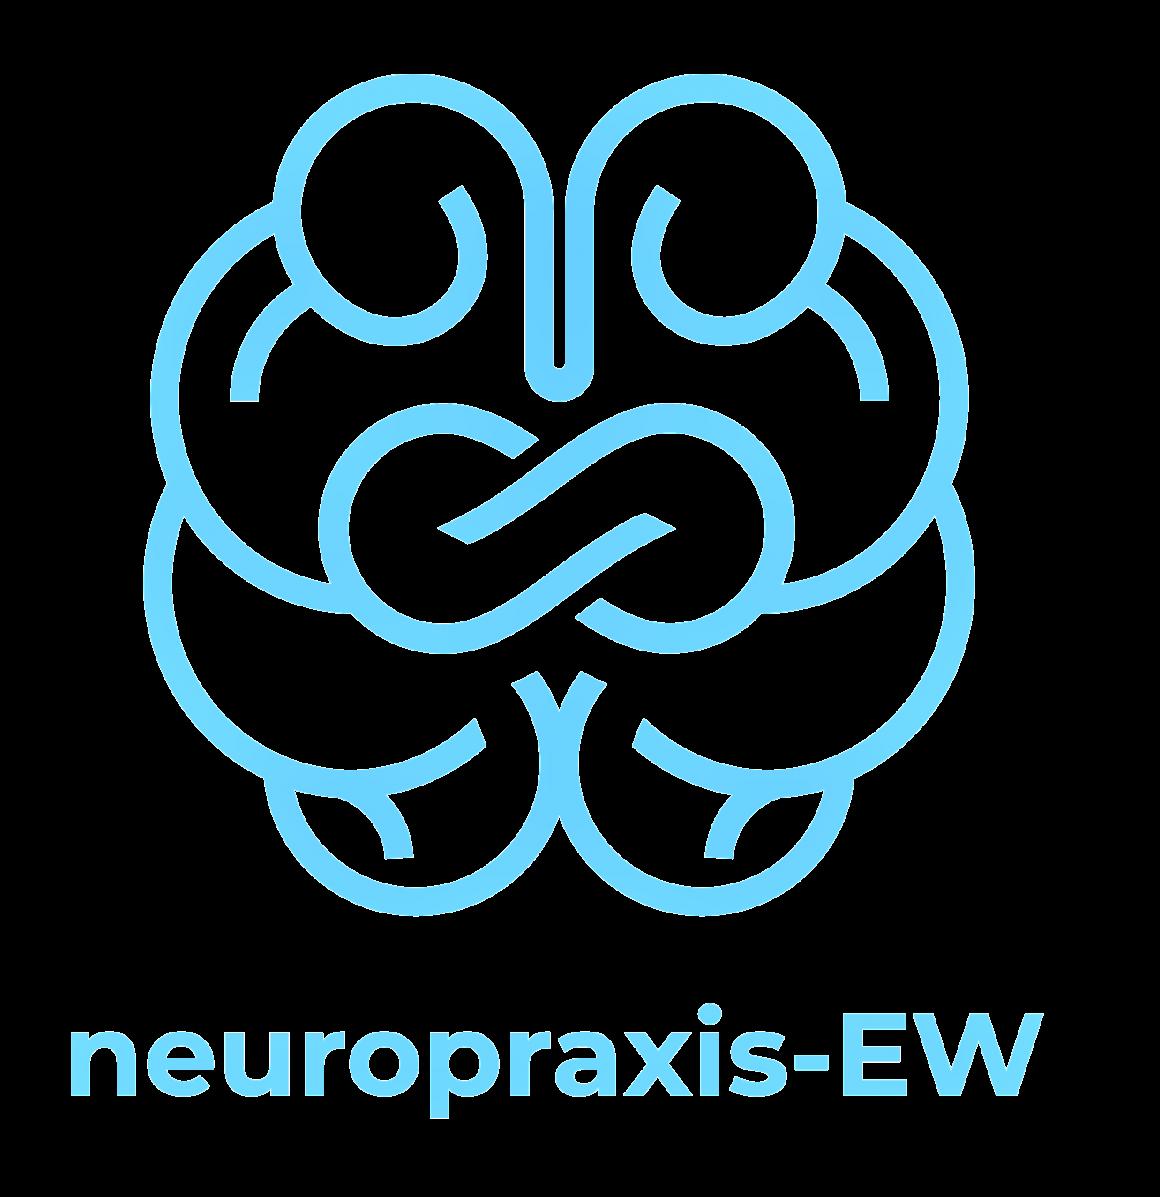 NEUROPRAXIS-EW